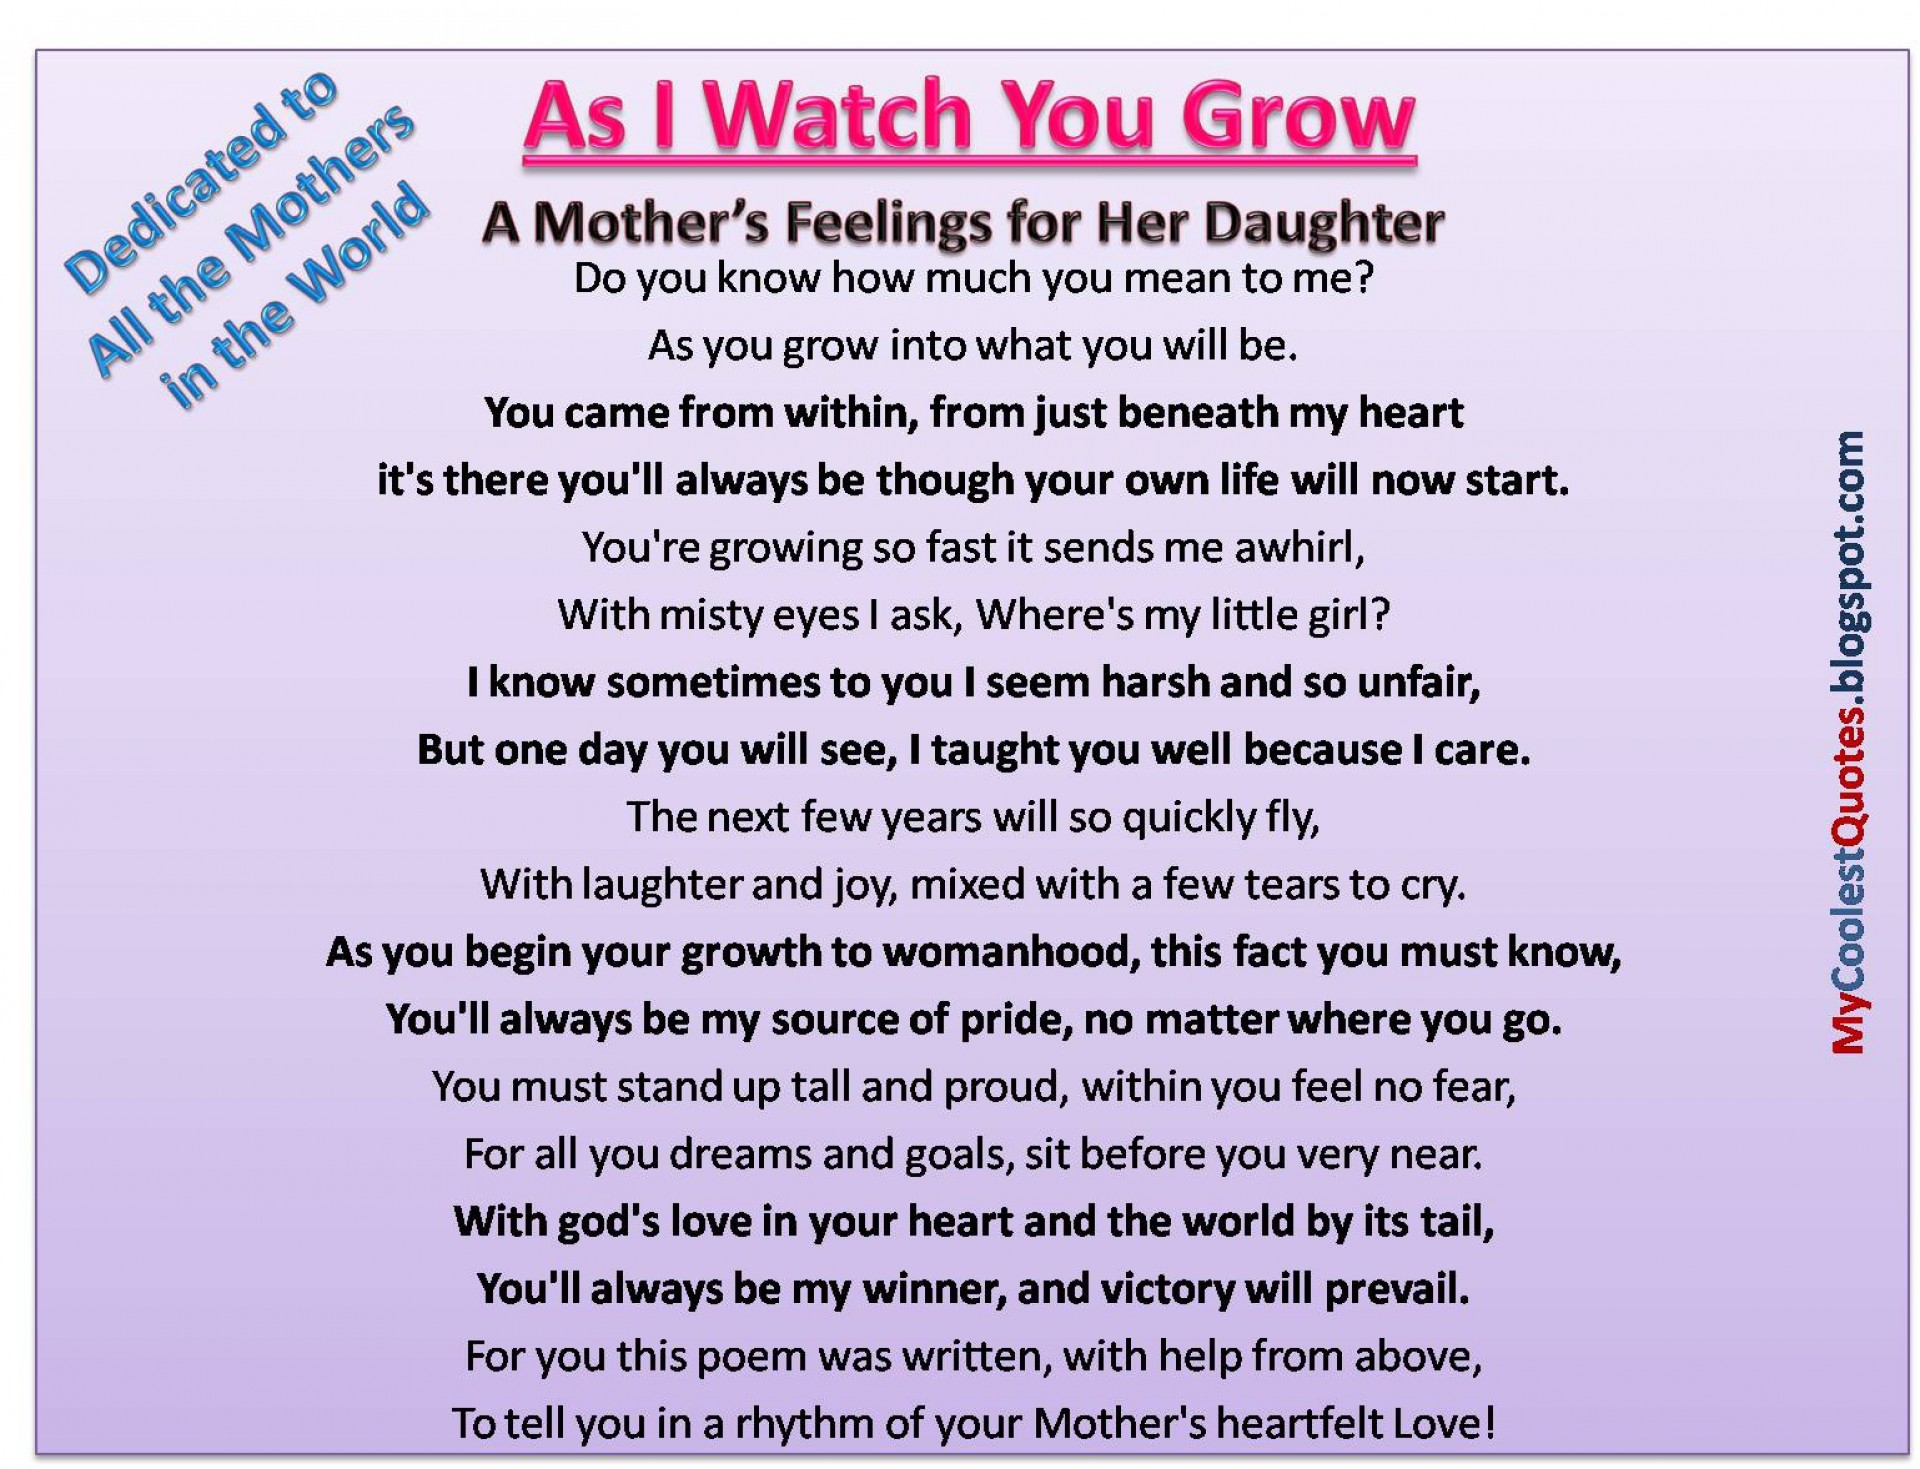 011 Mothersloveforherdaughter Mothers Love Essay Phenomenal Wikipedia In Tamil On Gujarati 1920